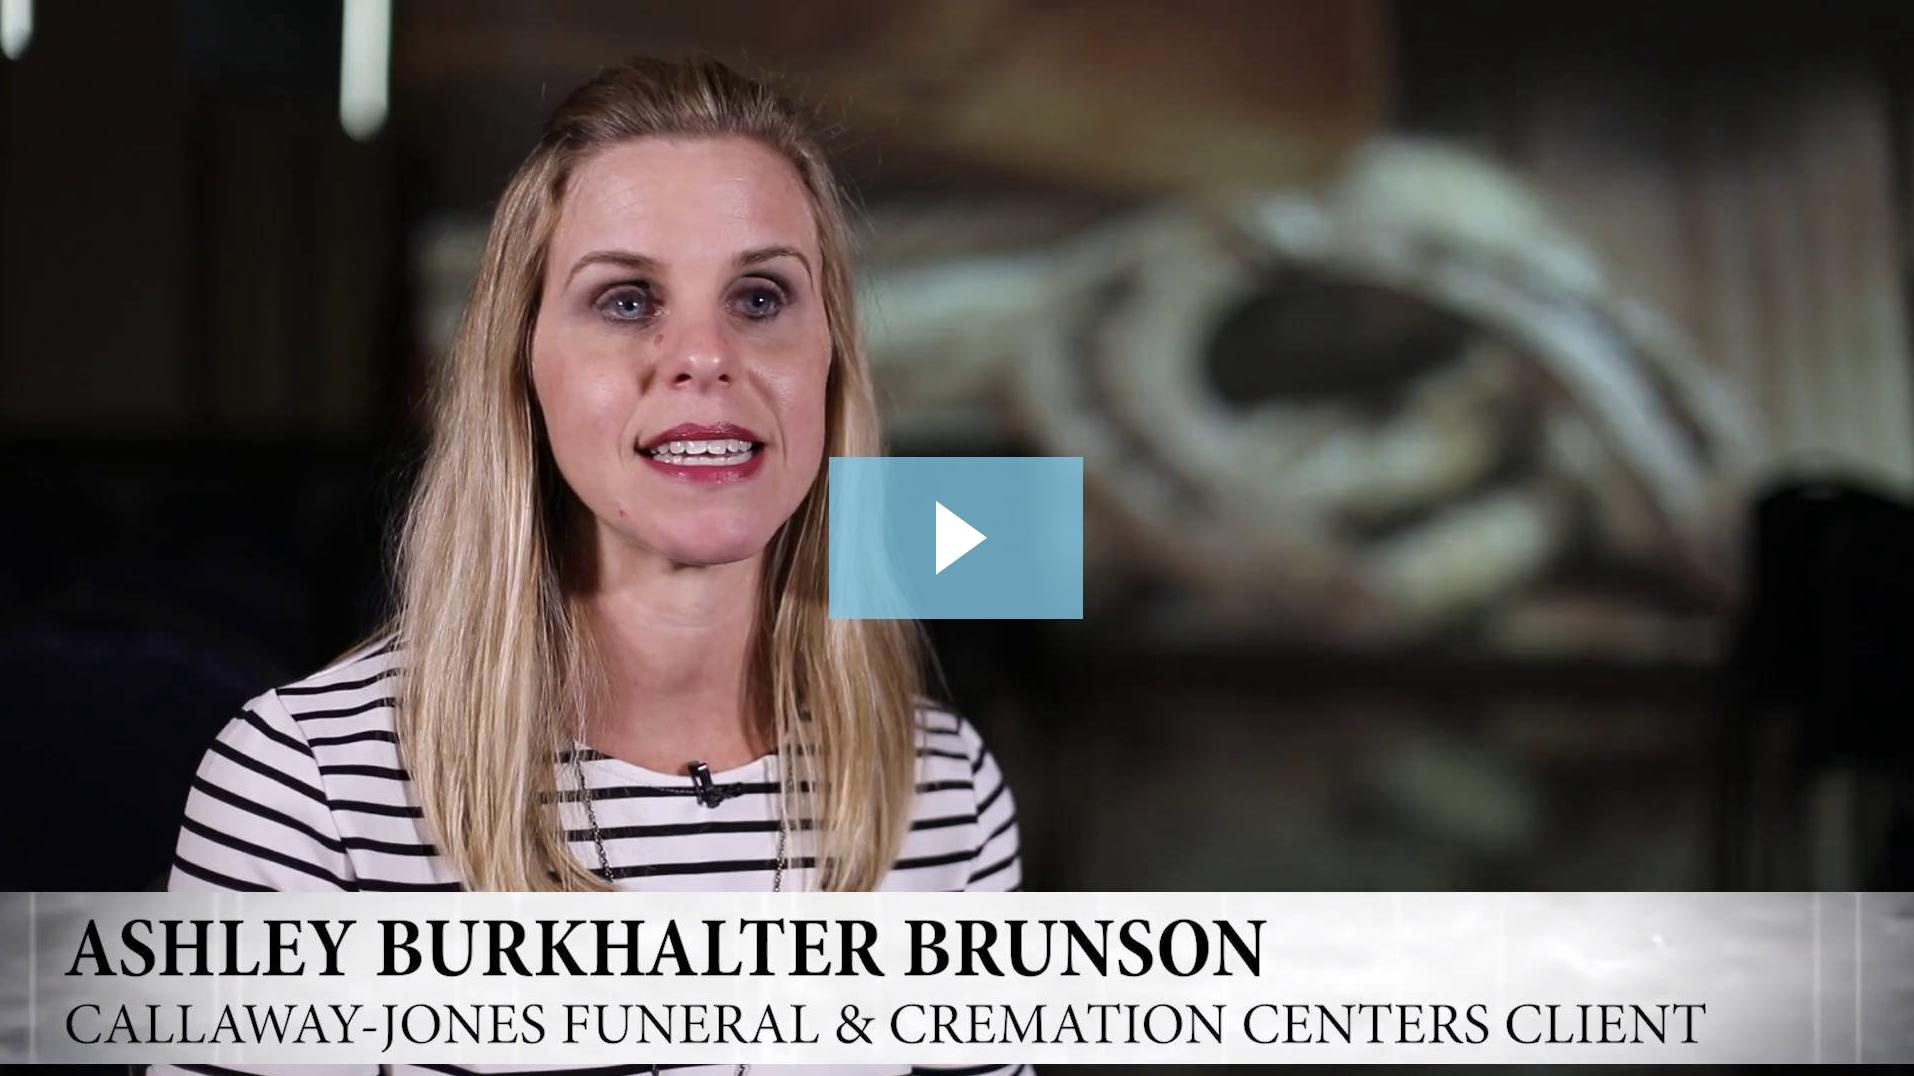 Funeral Review - Ashley Burkhalter Brunson